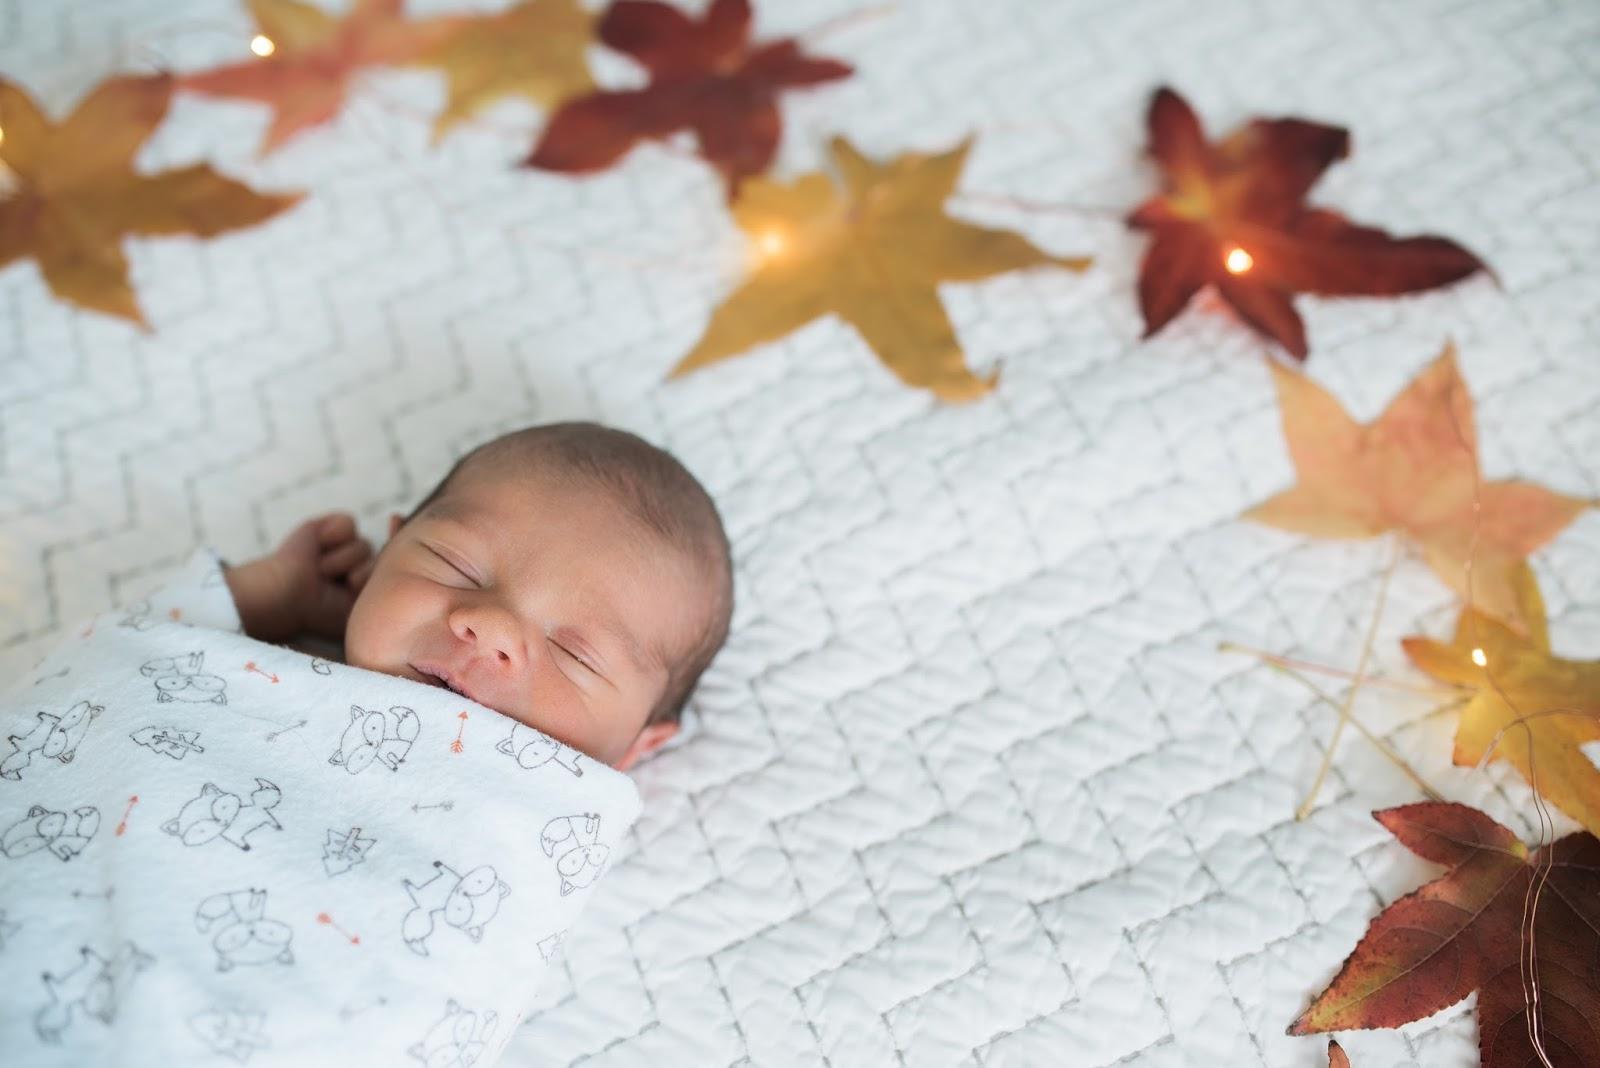 Christy Golder Photography: Kleinertz Family - in home newborn session